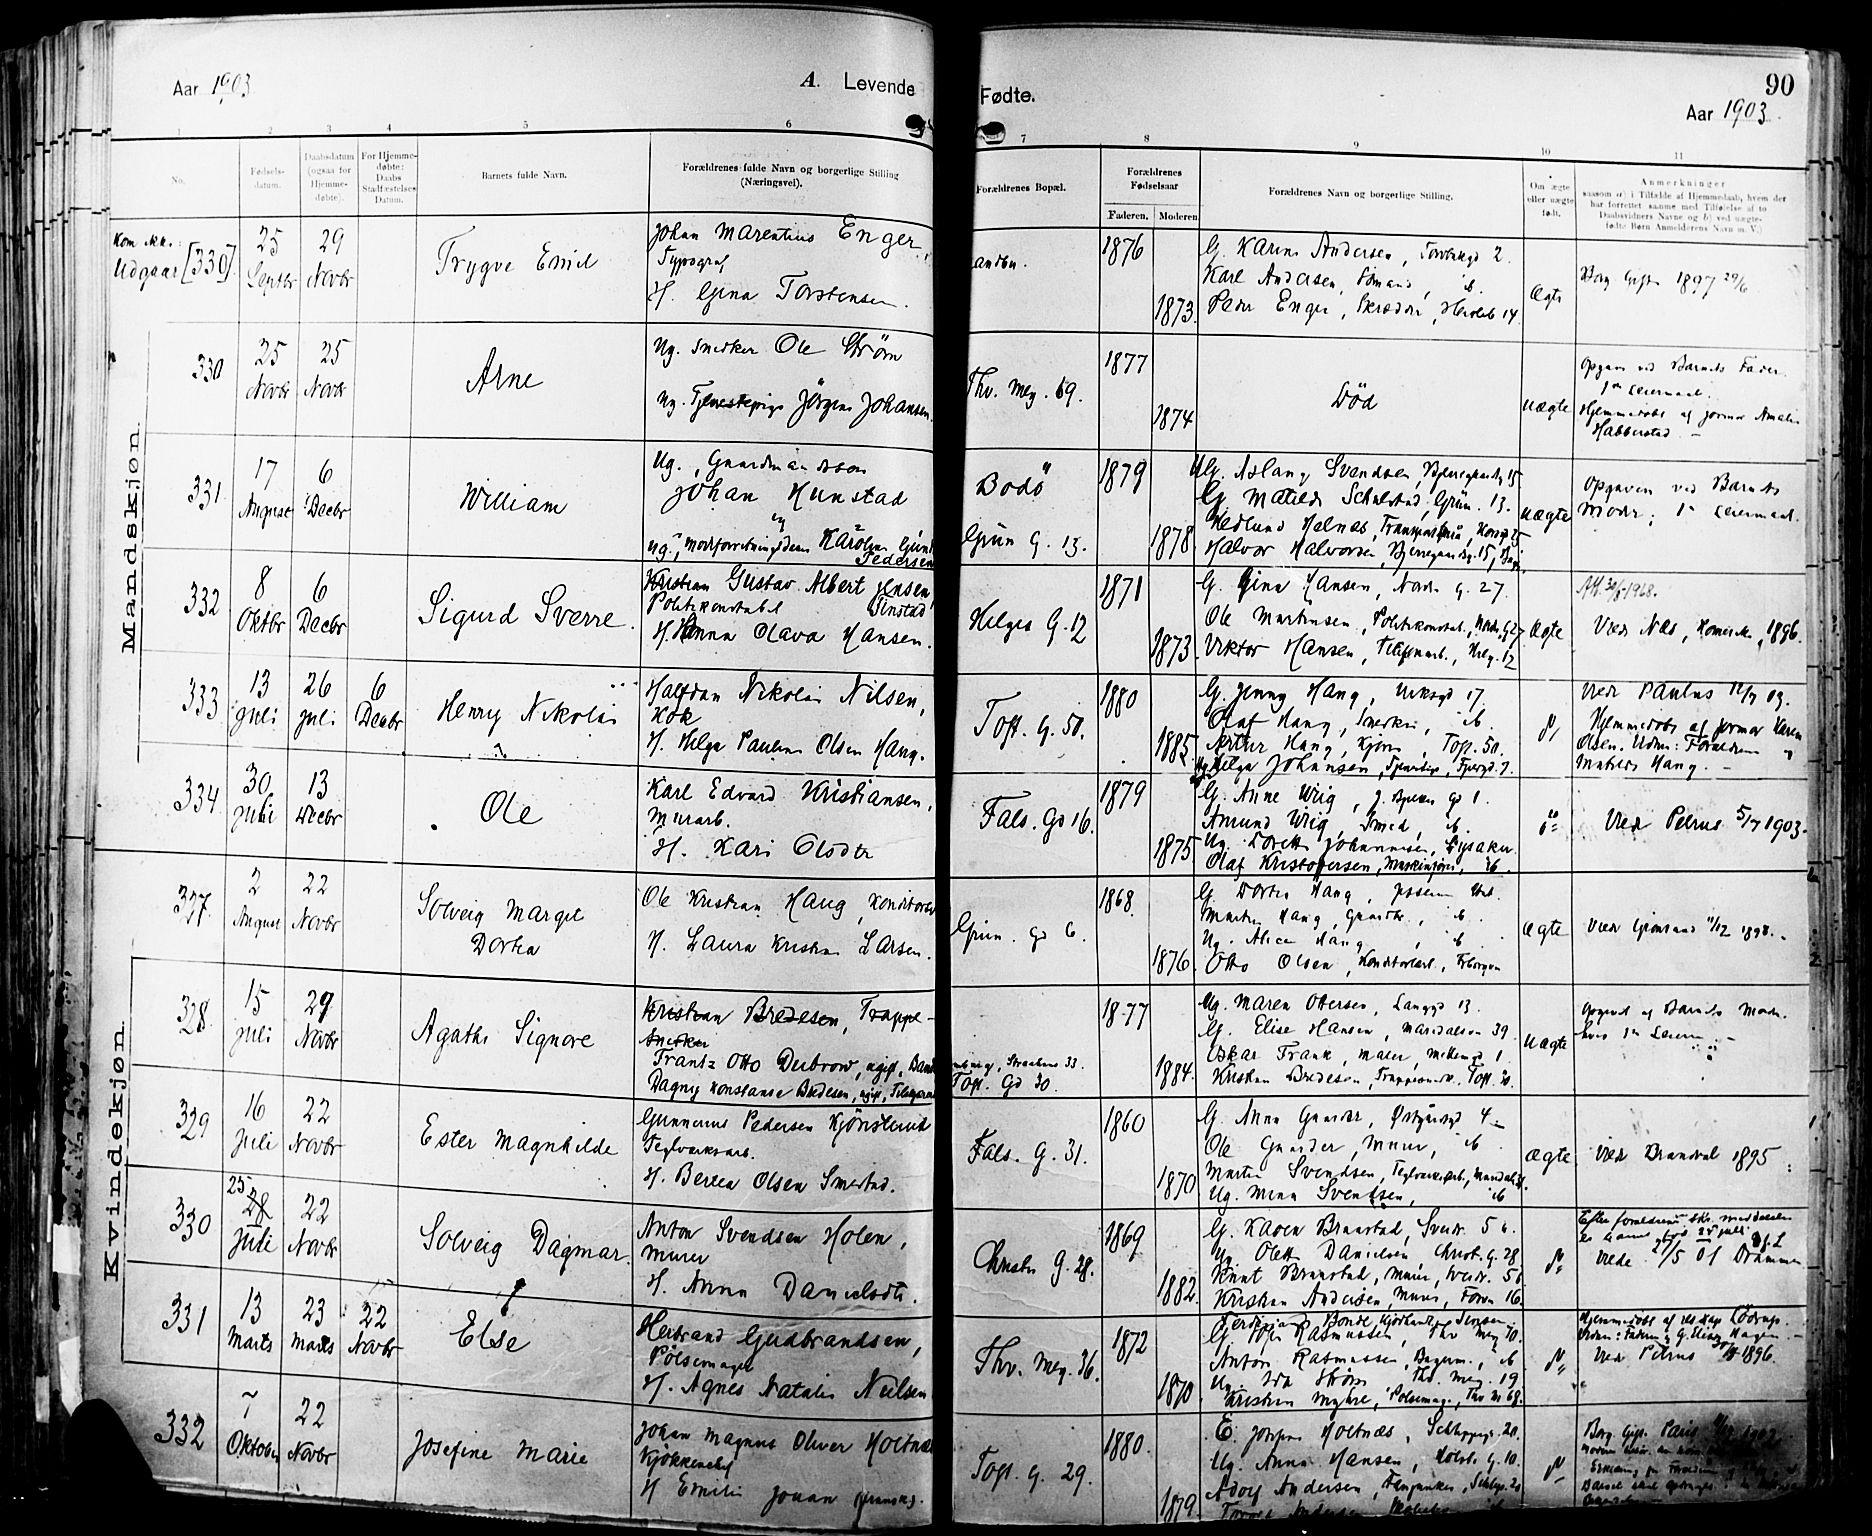 SAO, Paulus prestekontor Kirkebøker, F/Fa/L0016: Ministerialbok nr. 16, 1902-1906, s. 90